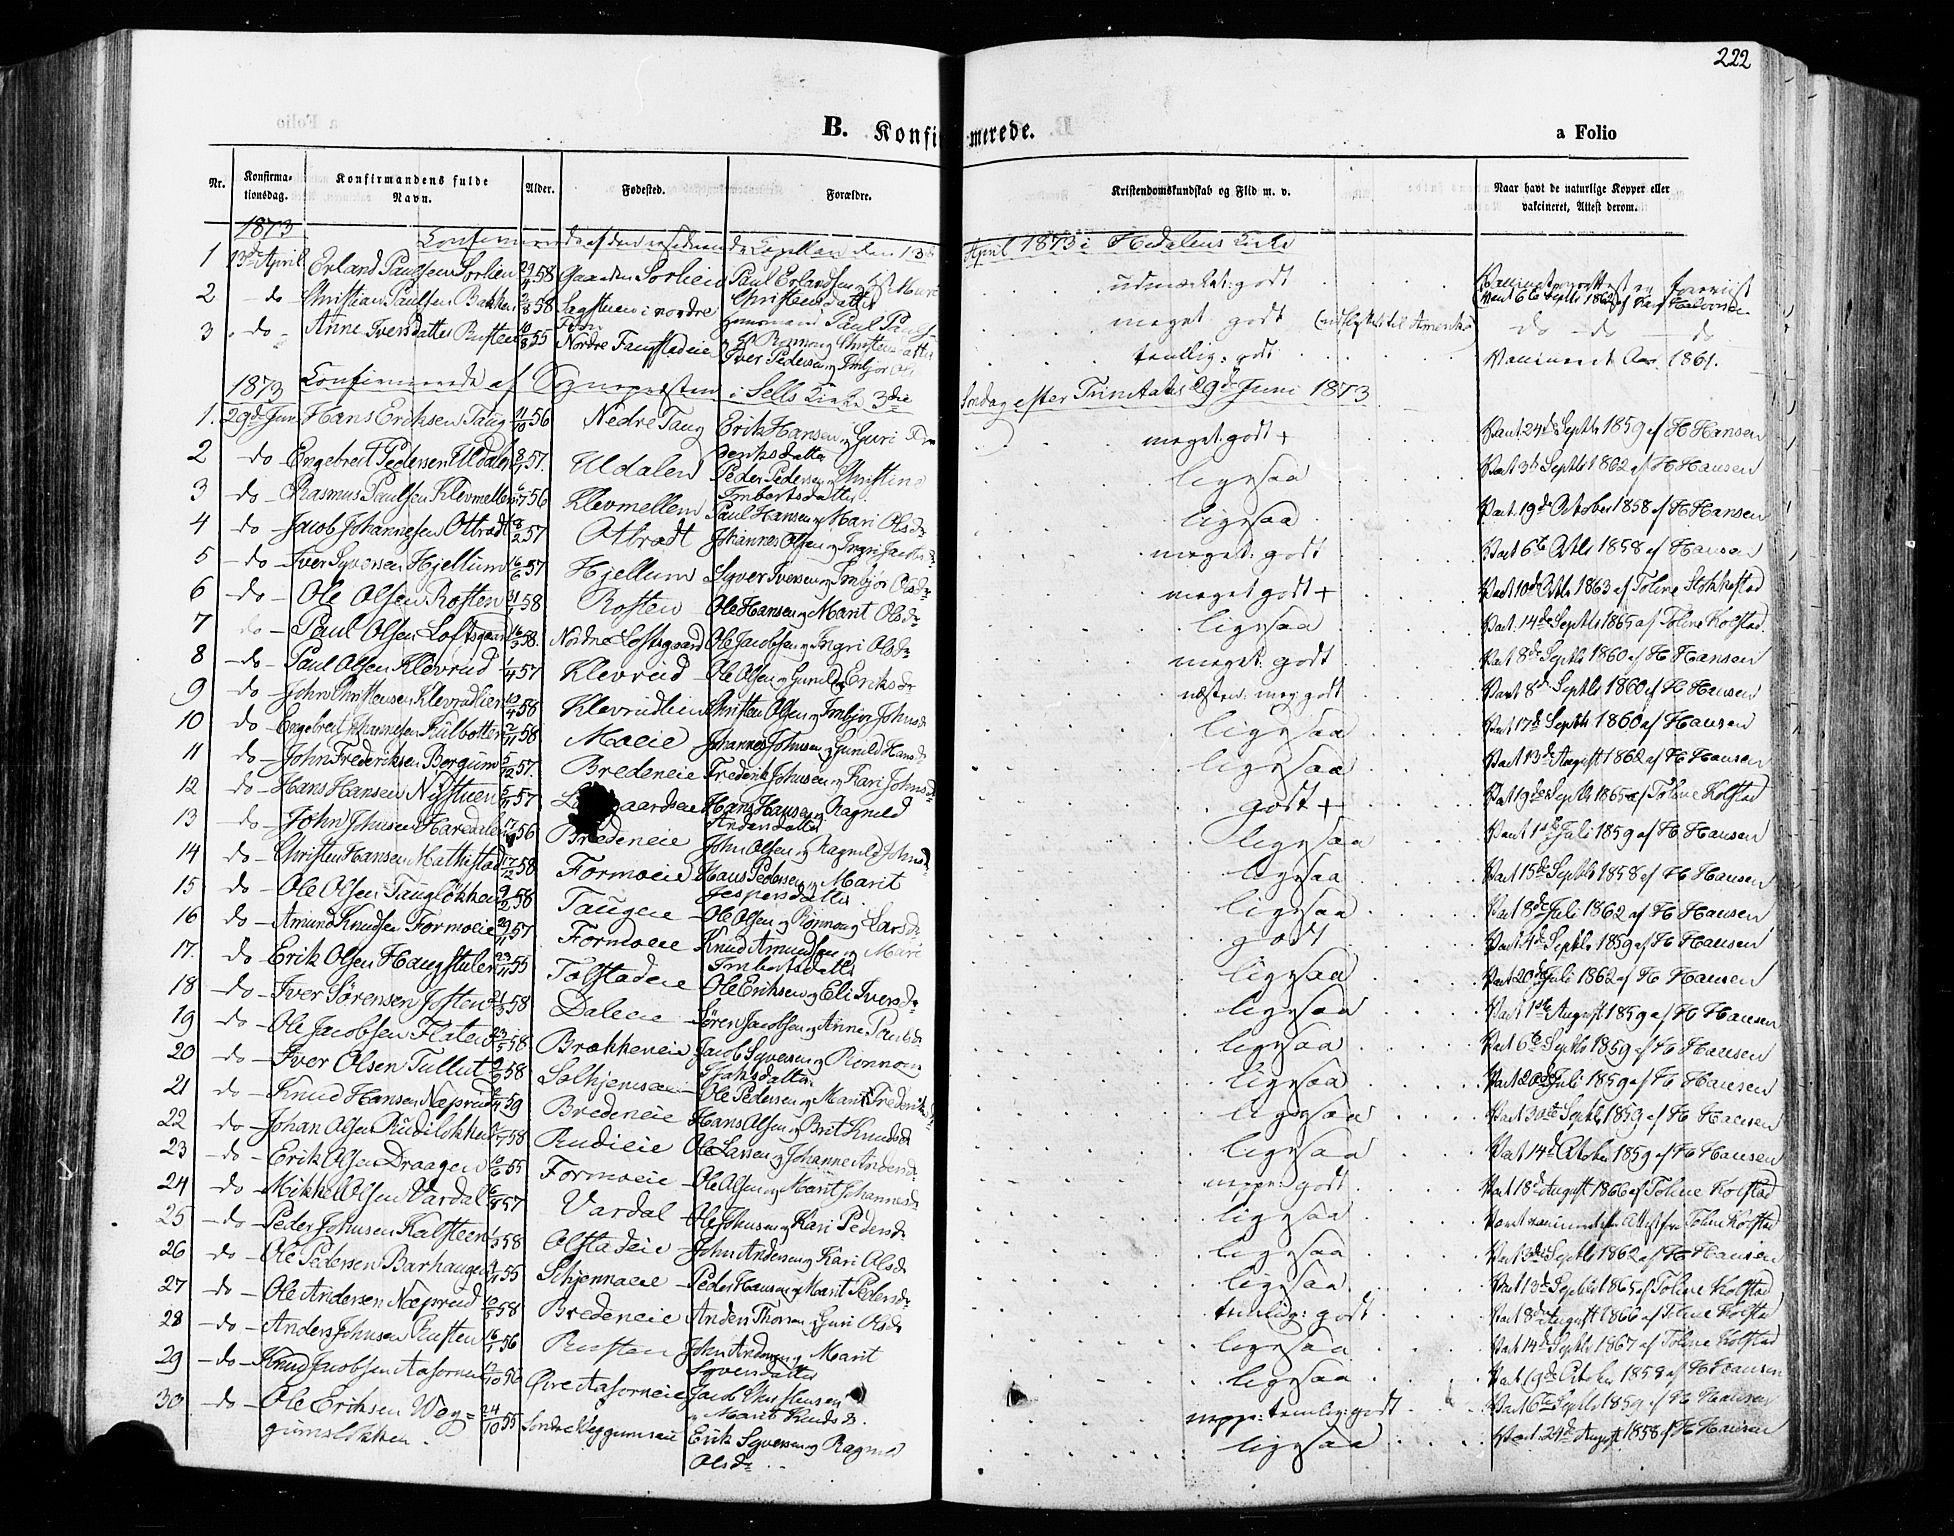 SAH, Vågå prestekontor, Ministerialbok nr. 7 /1, 1872-1886, s. 222